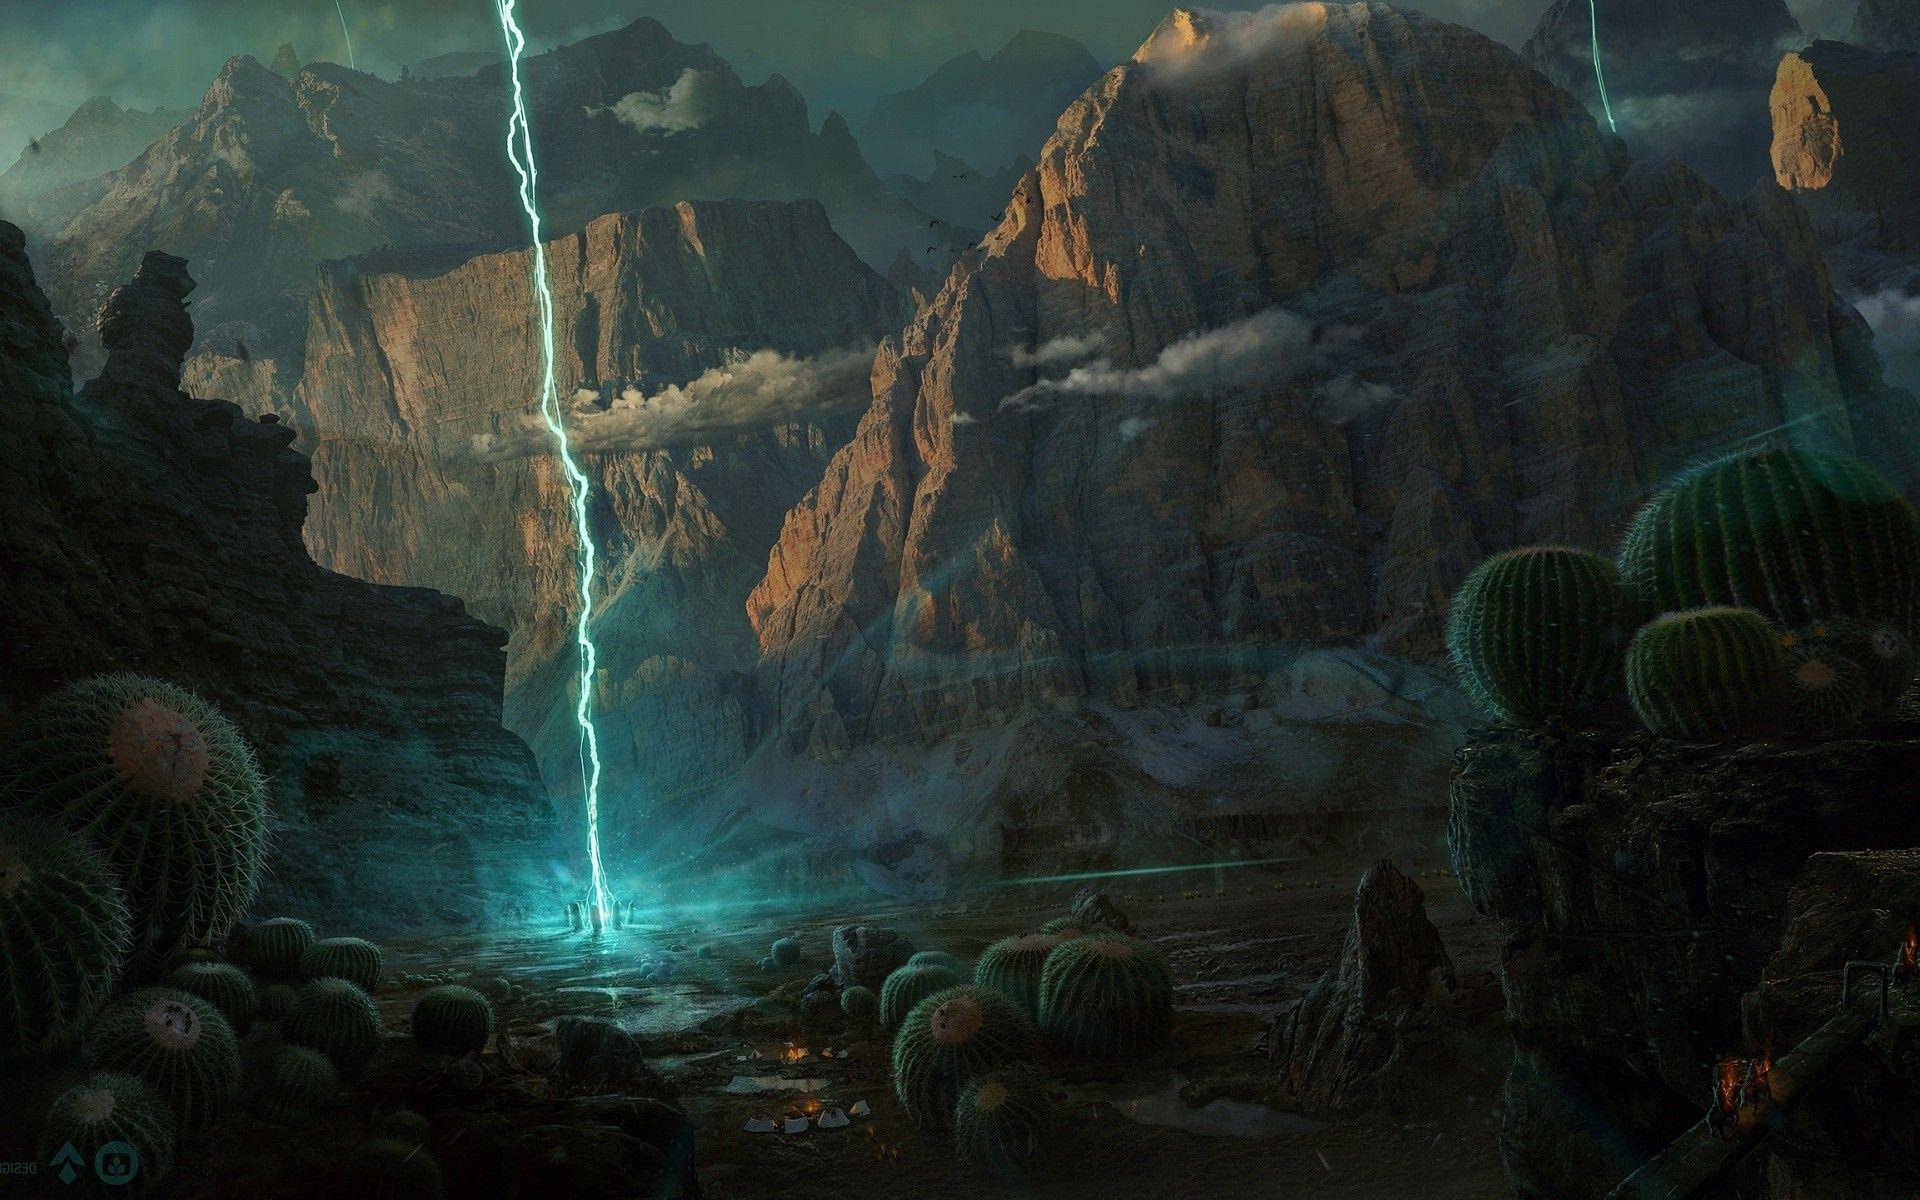 Digital Art Fantasy Landscape Widescreen Wallpaper Free